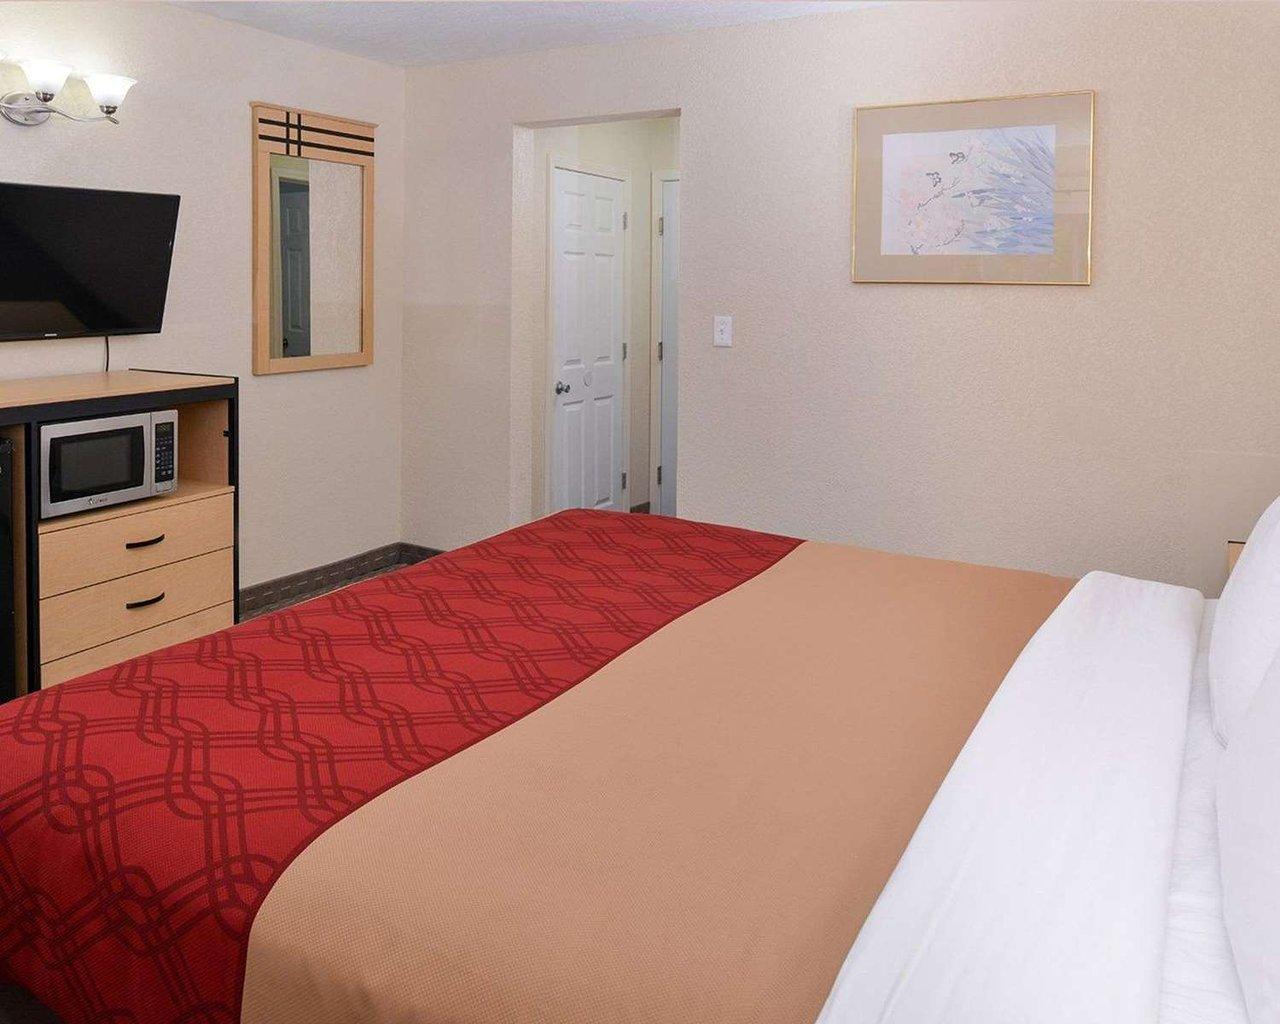 econo lodge 59 6 6 updated 2019 prices motel reviews rh tripadvisor com